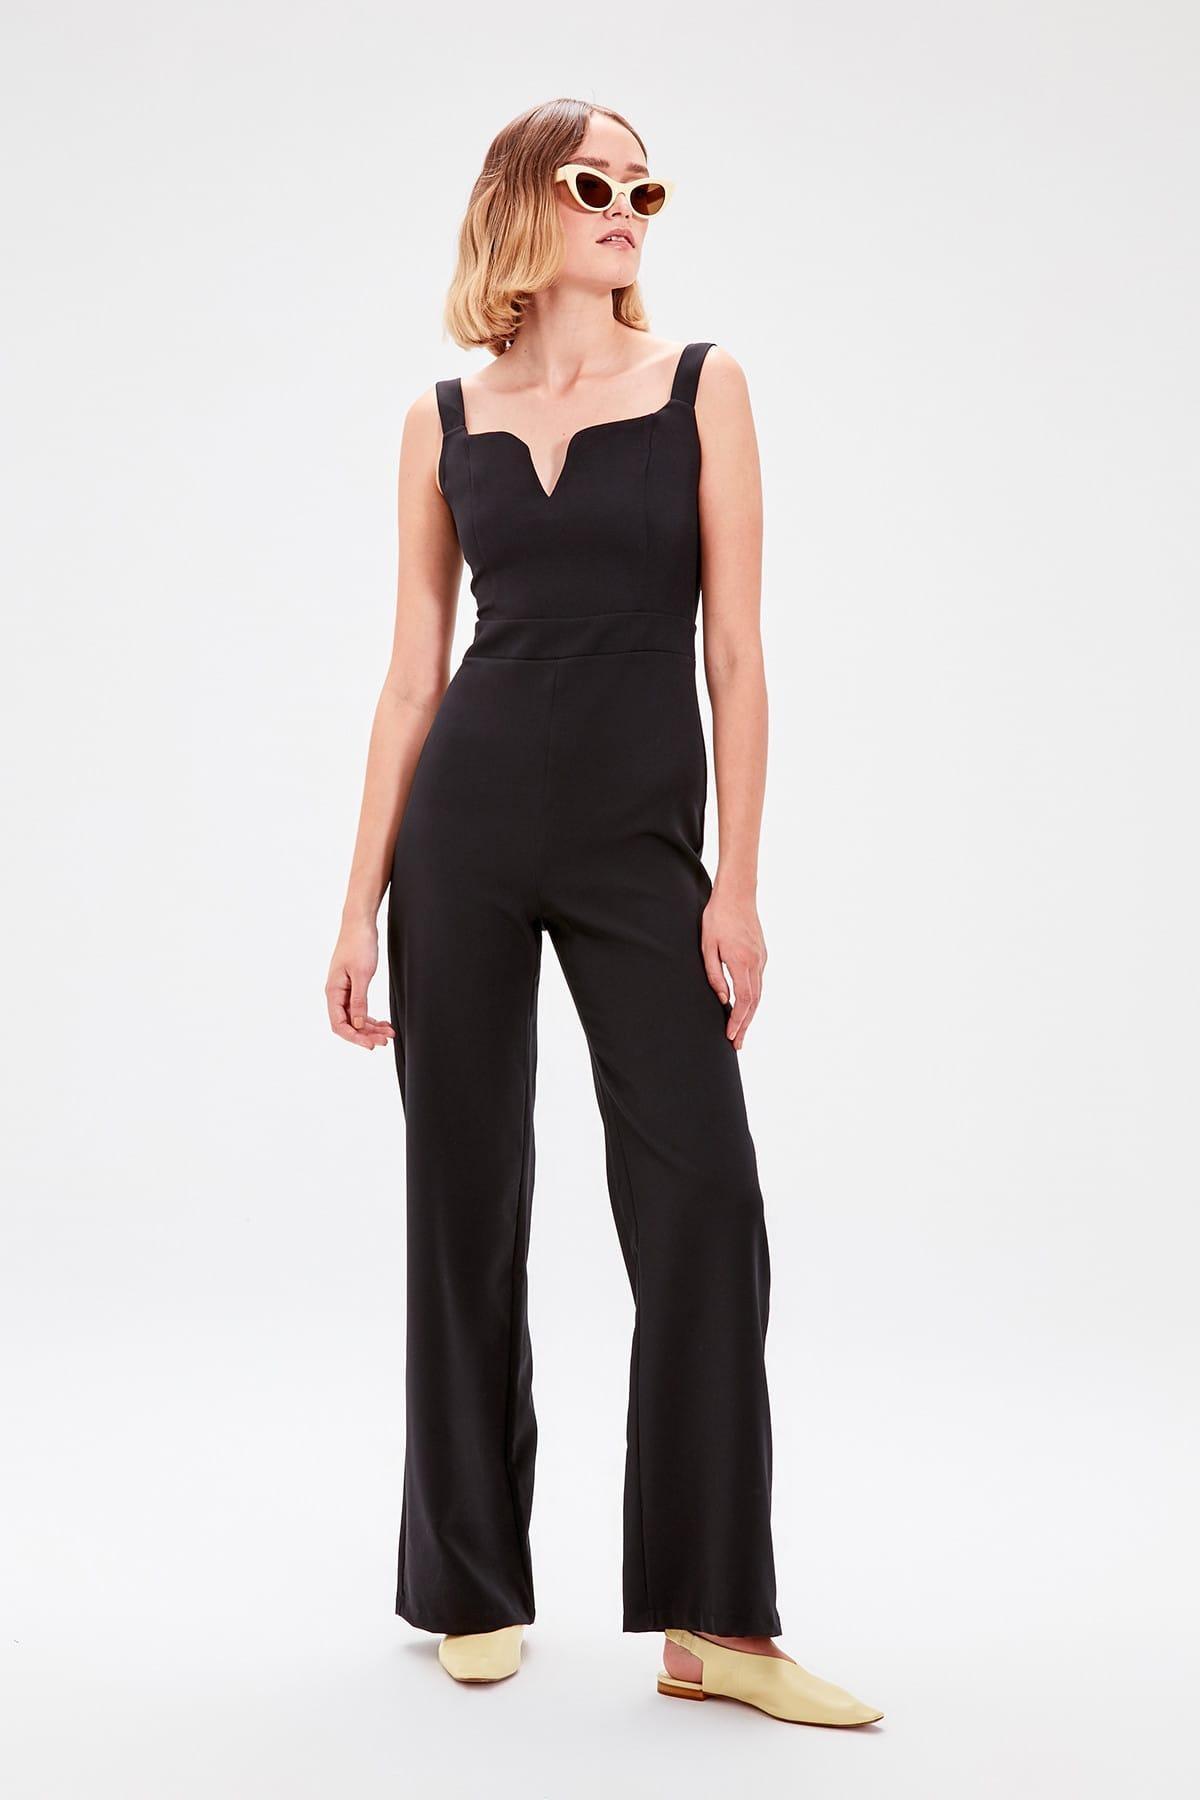 Trendyol Black Halter Jumpsuit TWOAW20TU0016